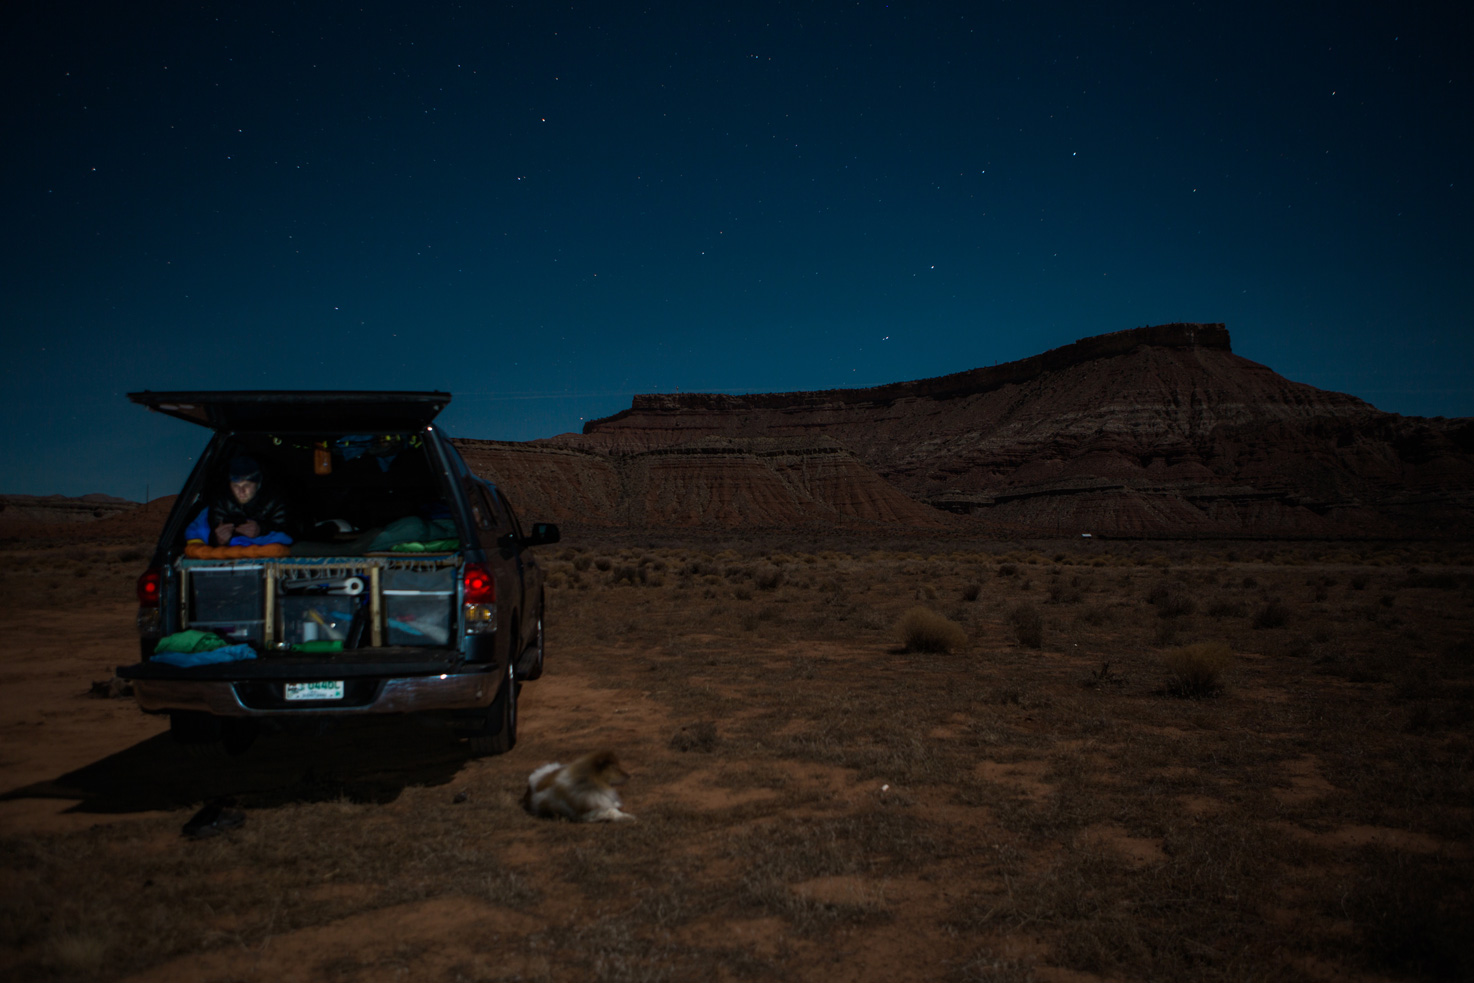 CindyGiovagnoli_Great_Sand_Dunes_Zion_National_Park_Horseshoe_Bend_Truck_Camping_Toyota_The_Narrows_roadtrip_Utah_Colorado-006.jpg